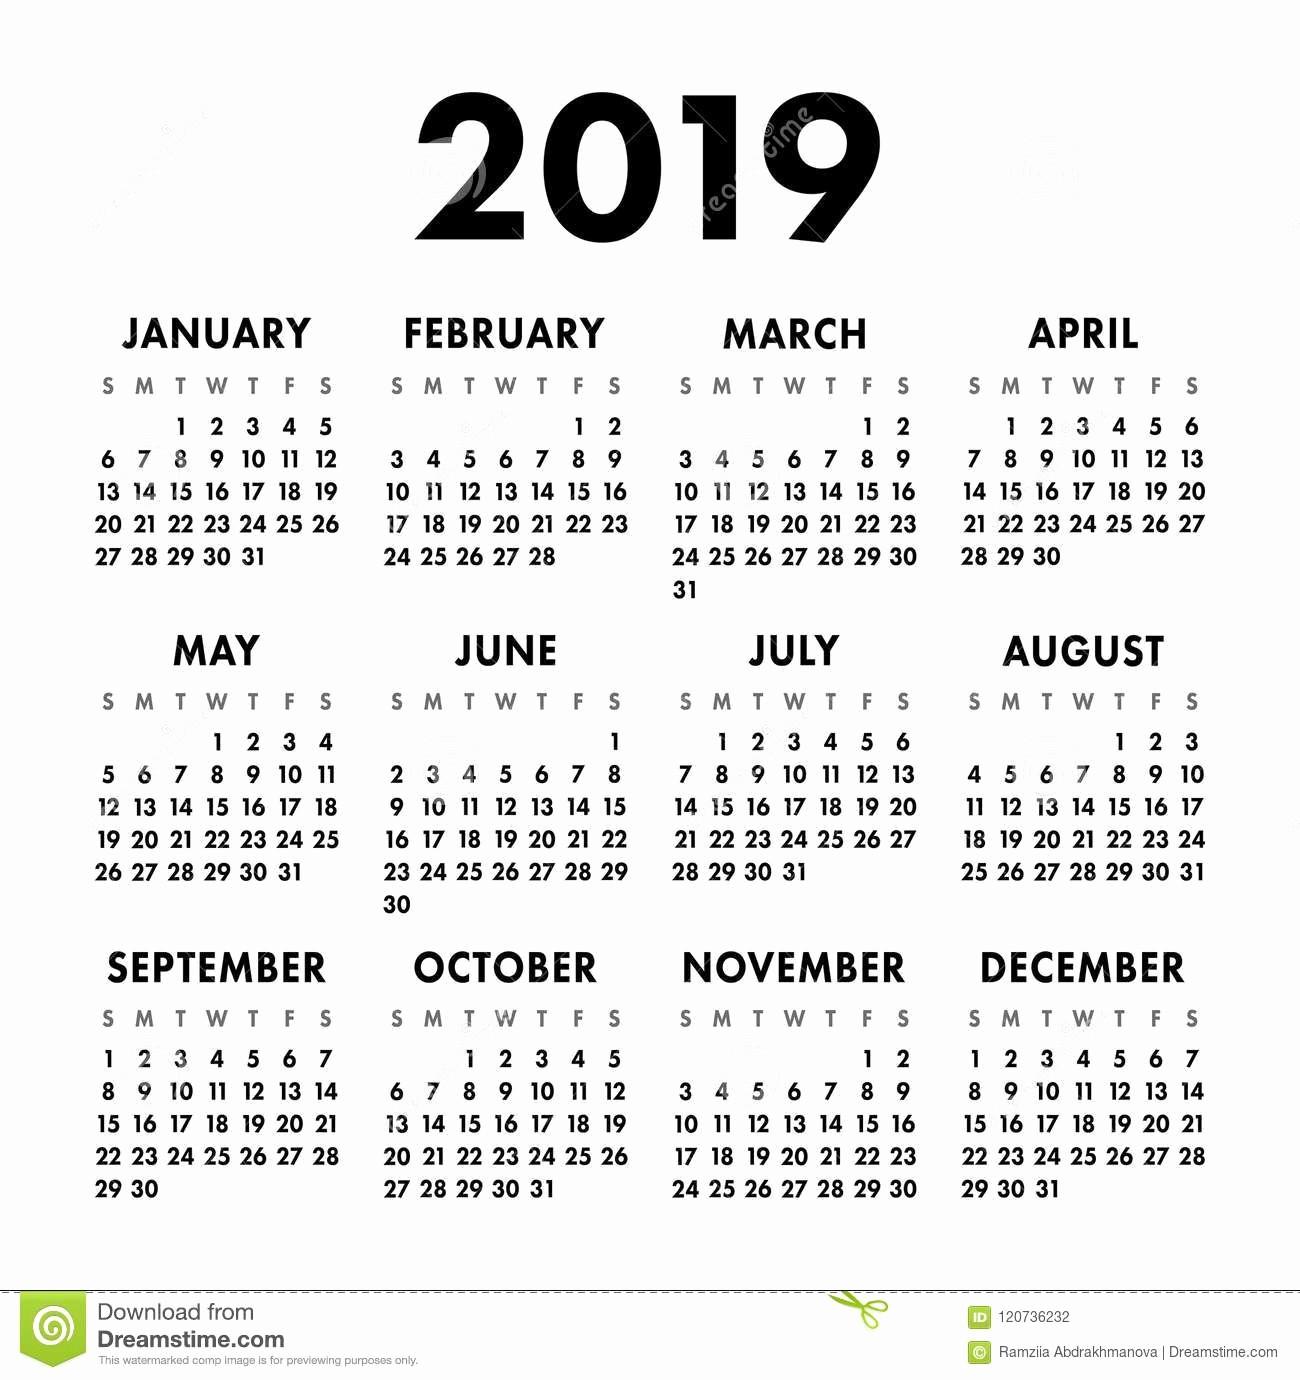 Black and White Calendar Template Luxury Calendar 2019 Year Black and White Vector Template Week